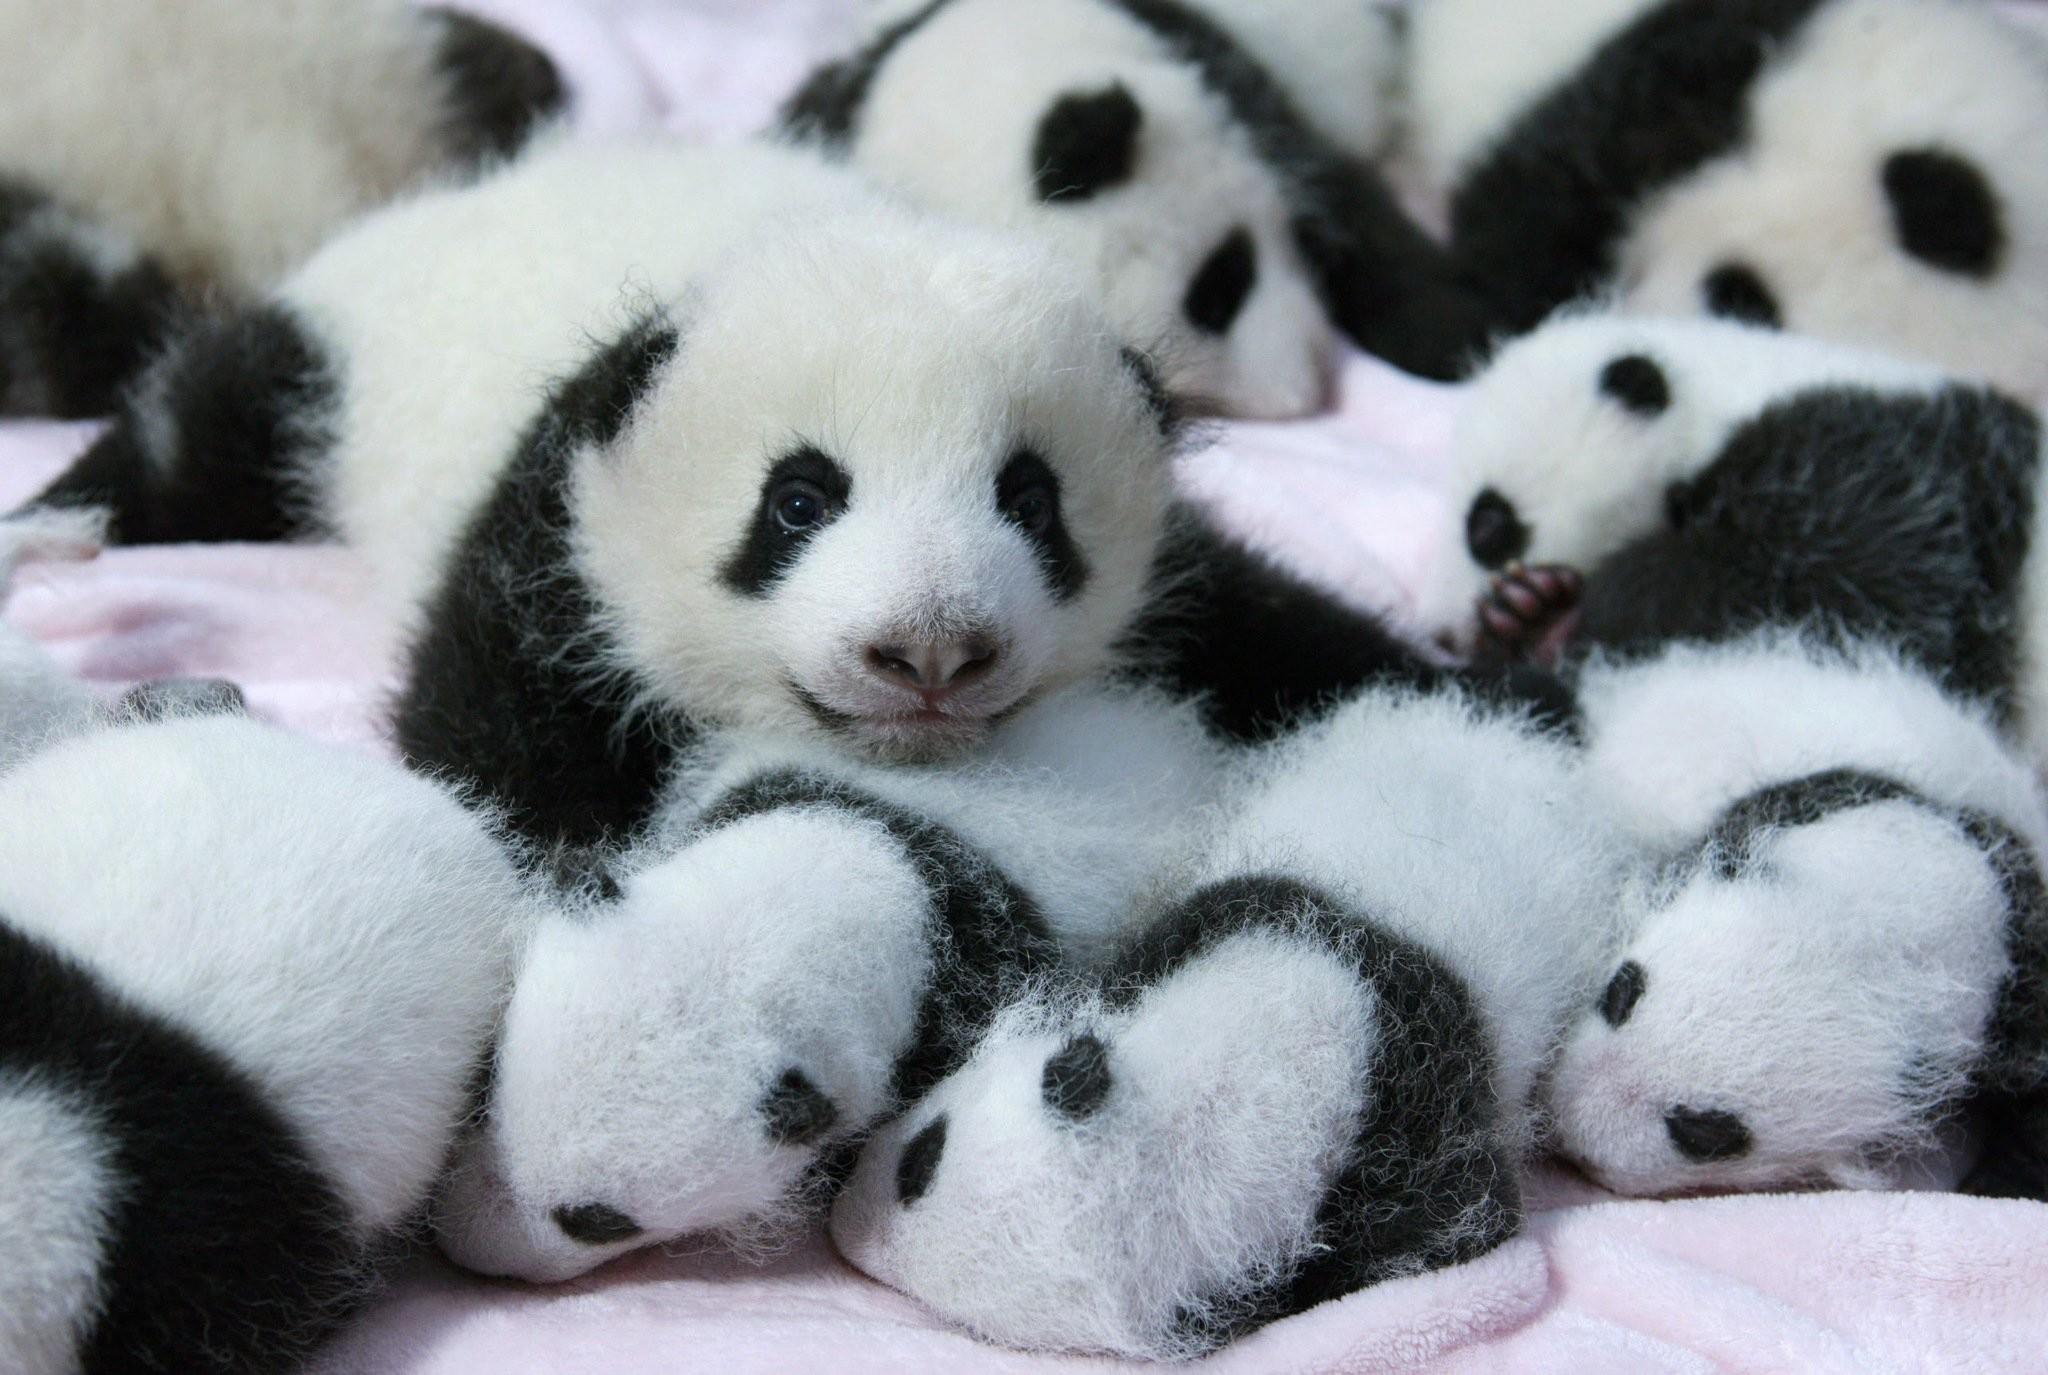 … free download cute panda wallpapers tumblr pixelstalk net …